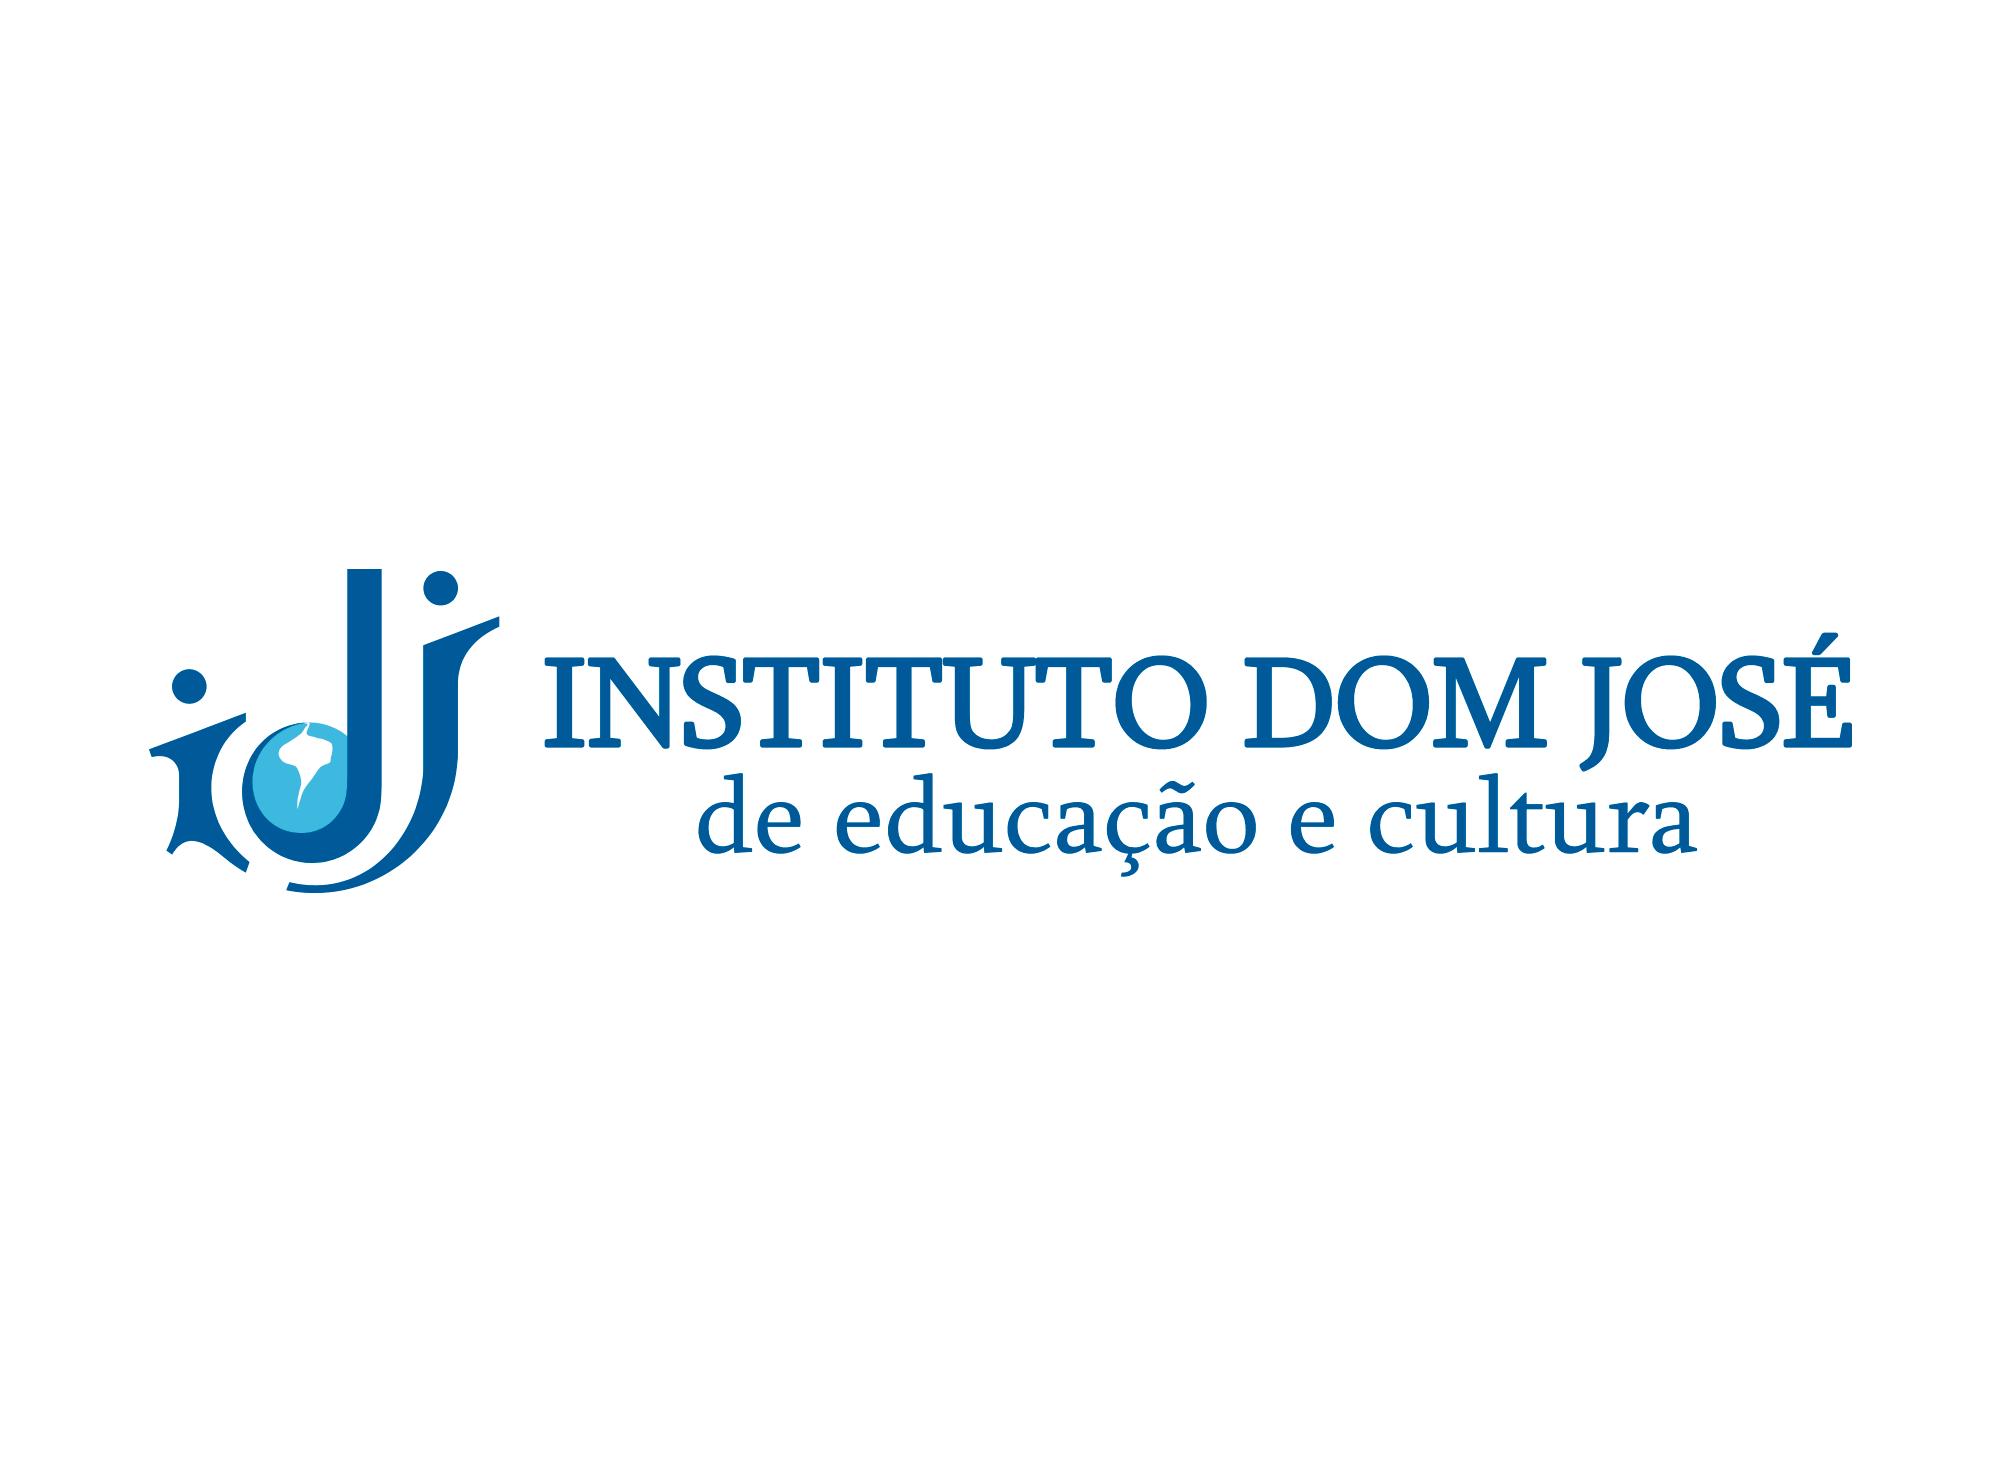 instittuto-dom-jose-isj-clientes-atendidos-agencia-diretriz-digital-marketing-fortaleza